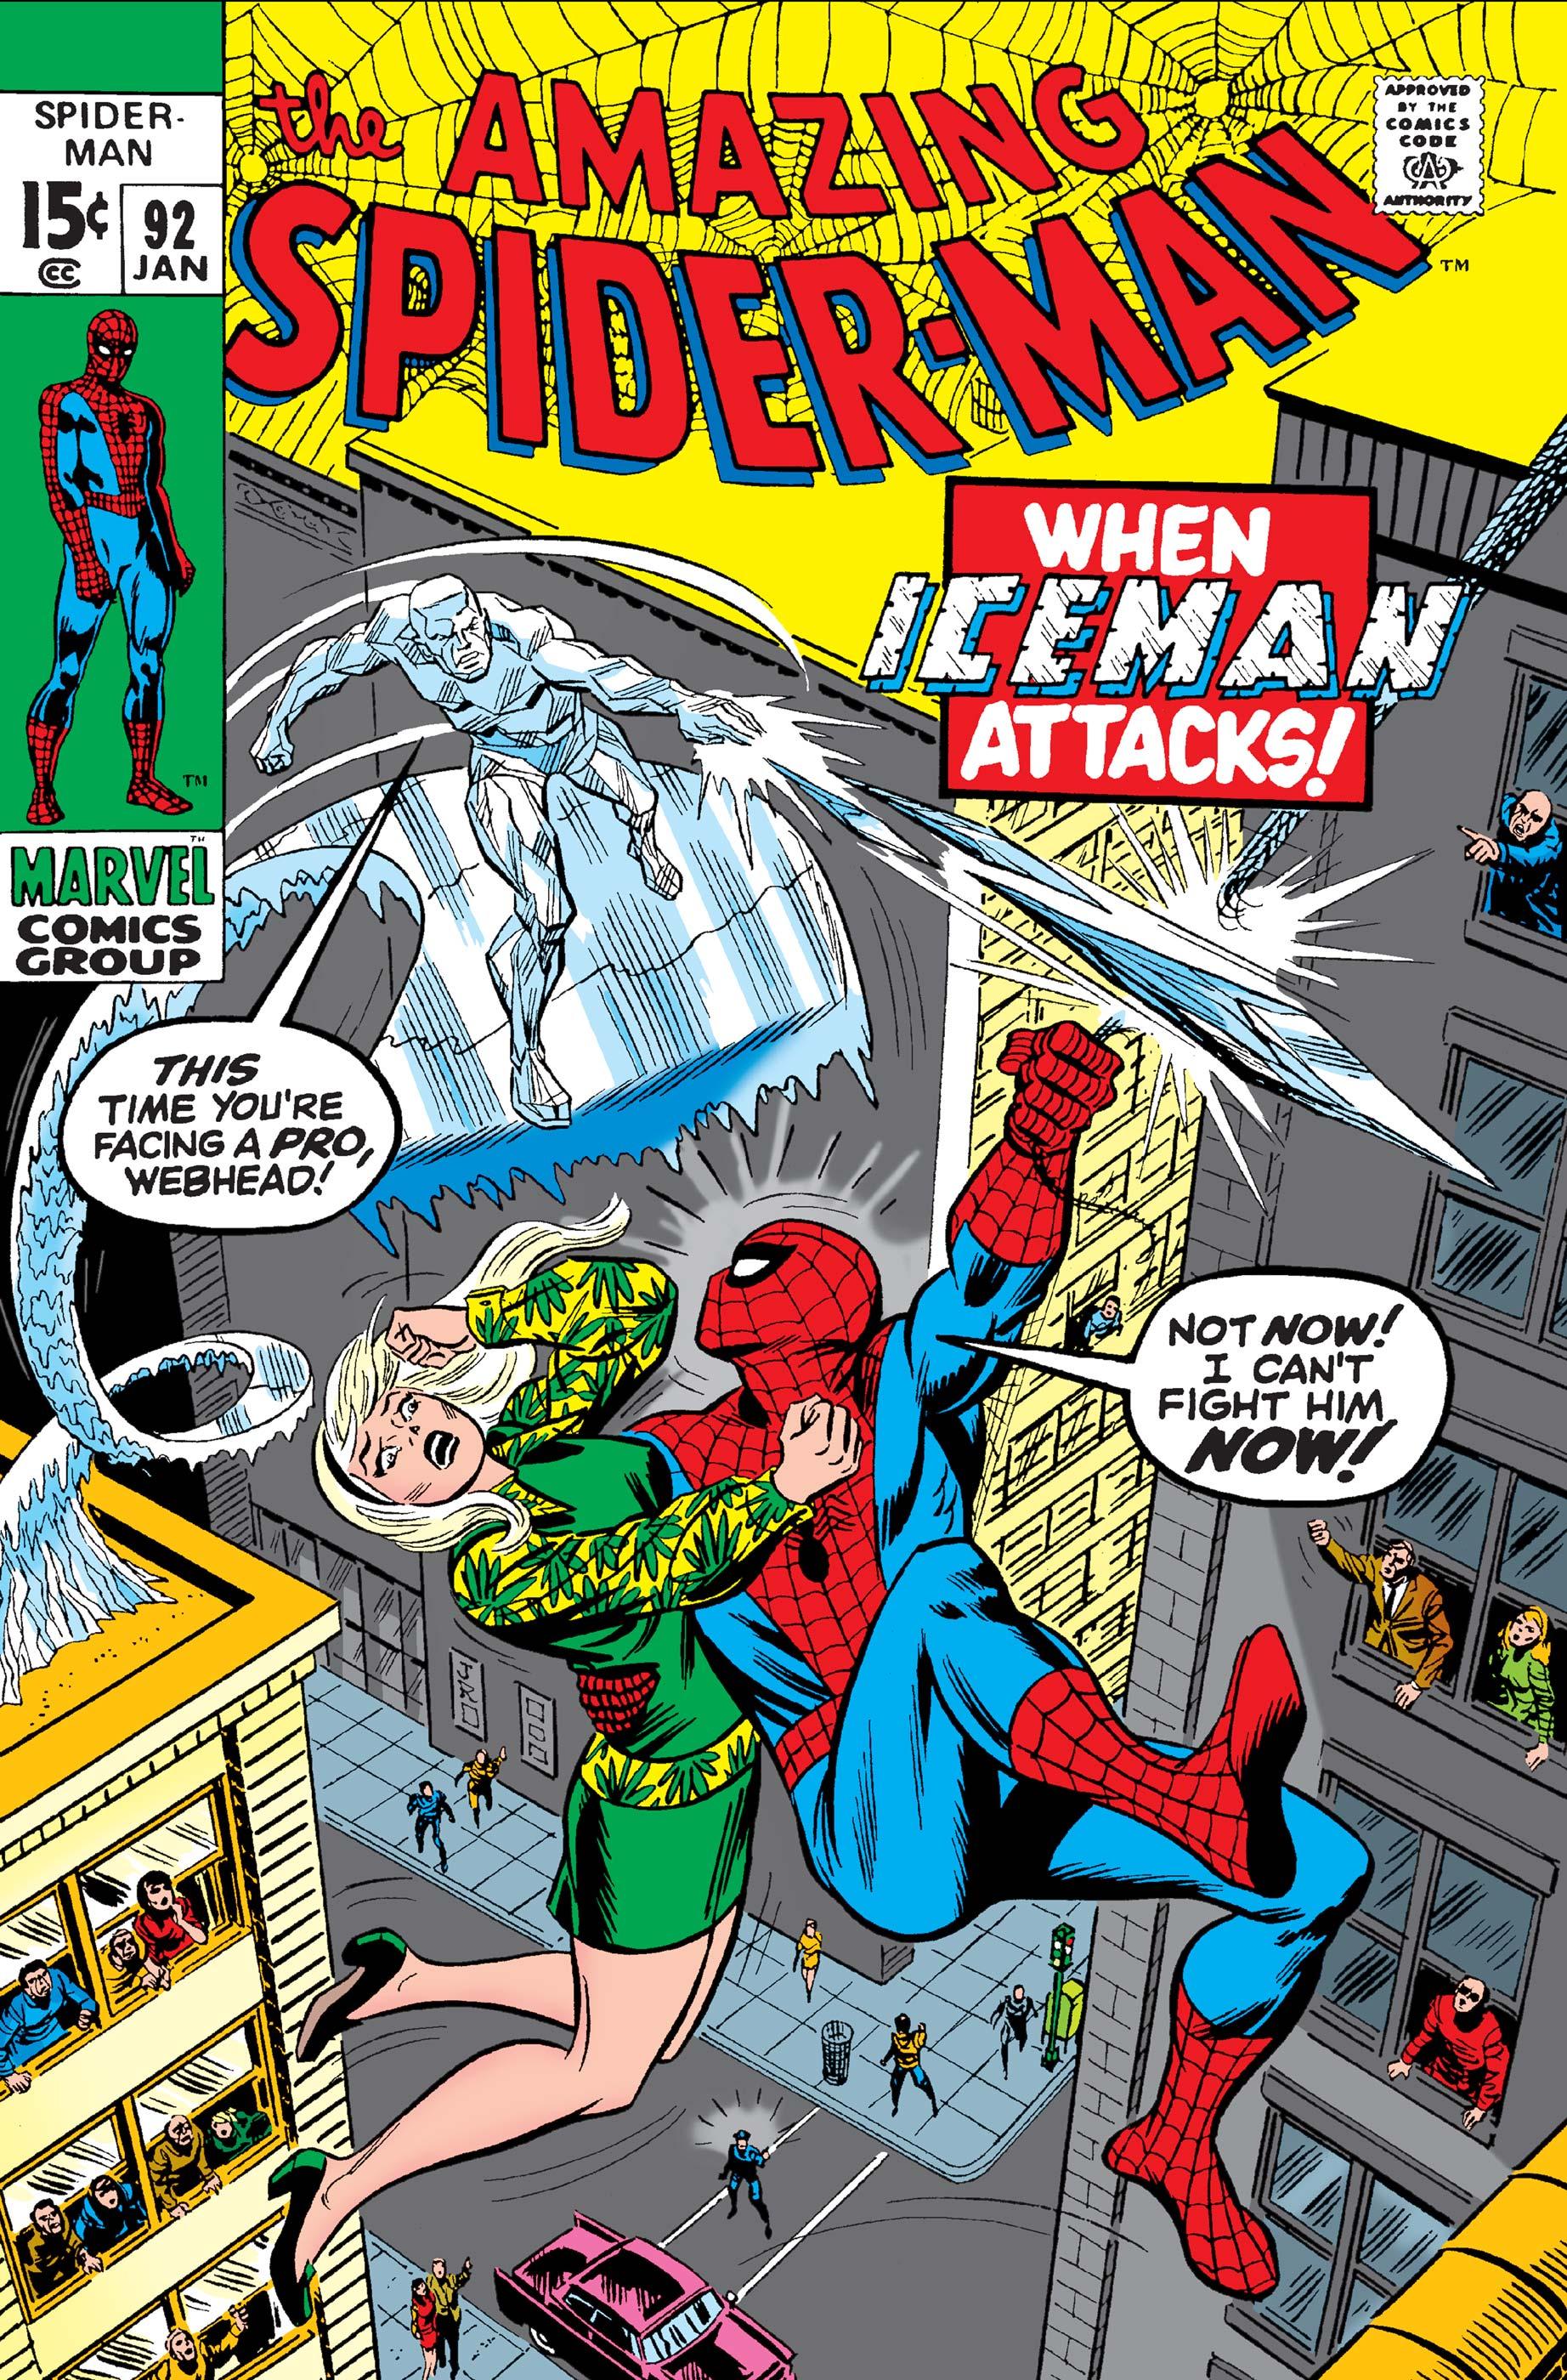 The Amazing Spider-Man (1963) #92